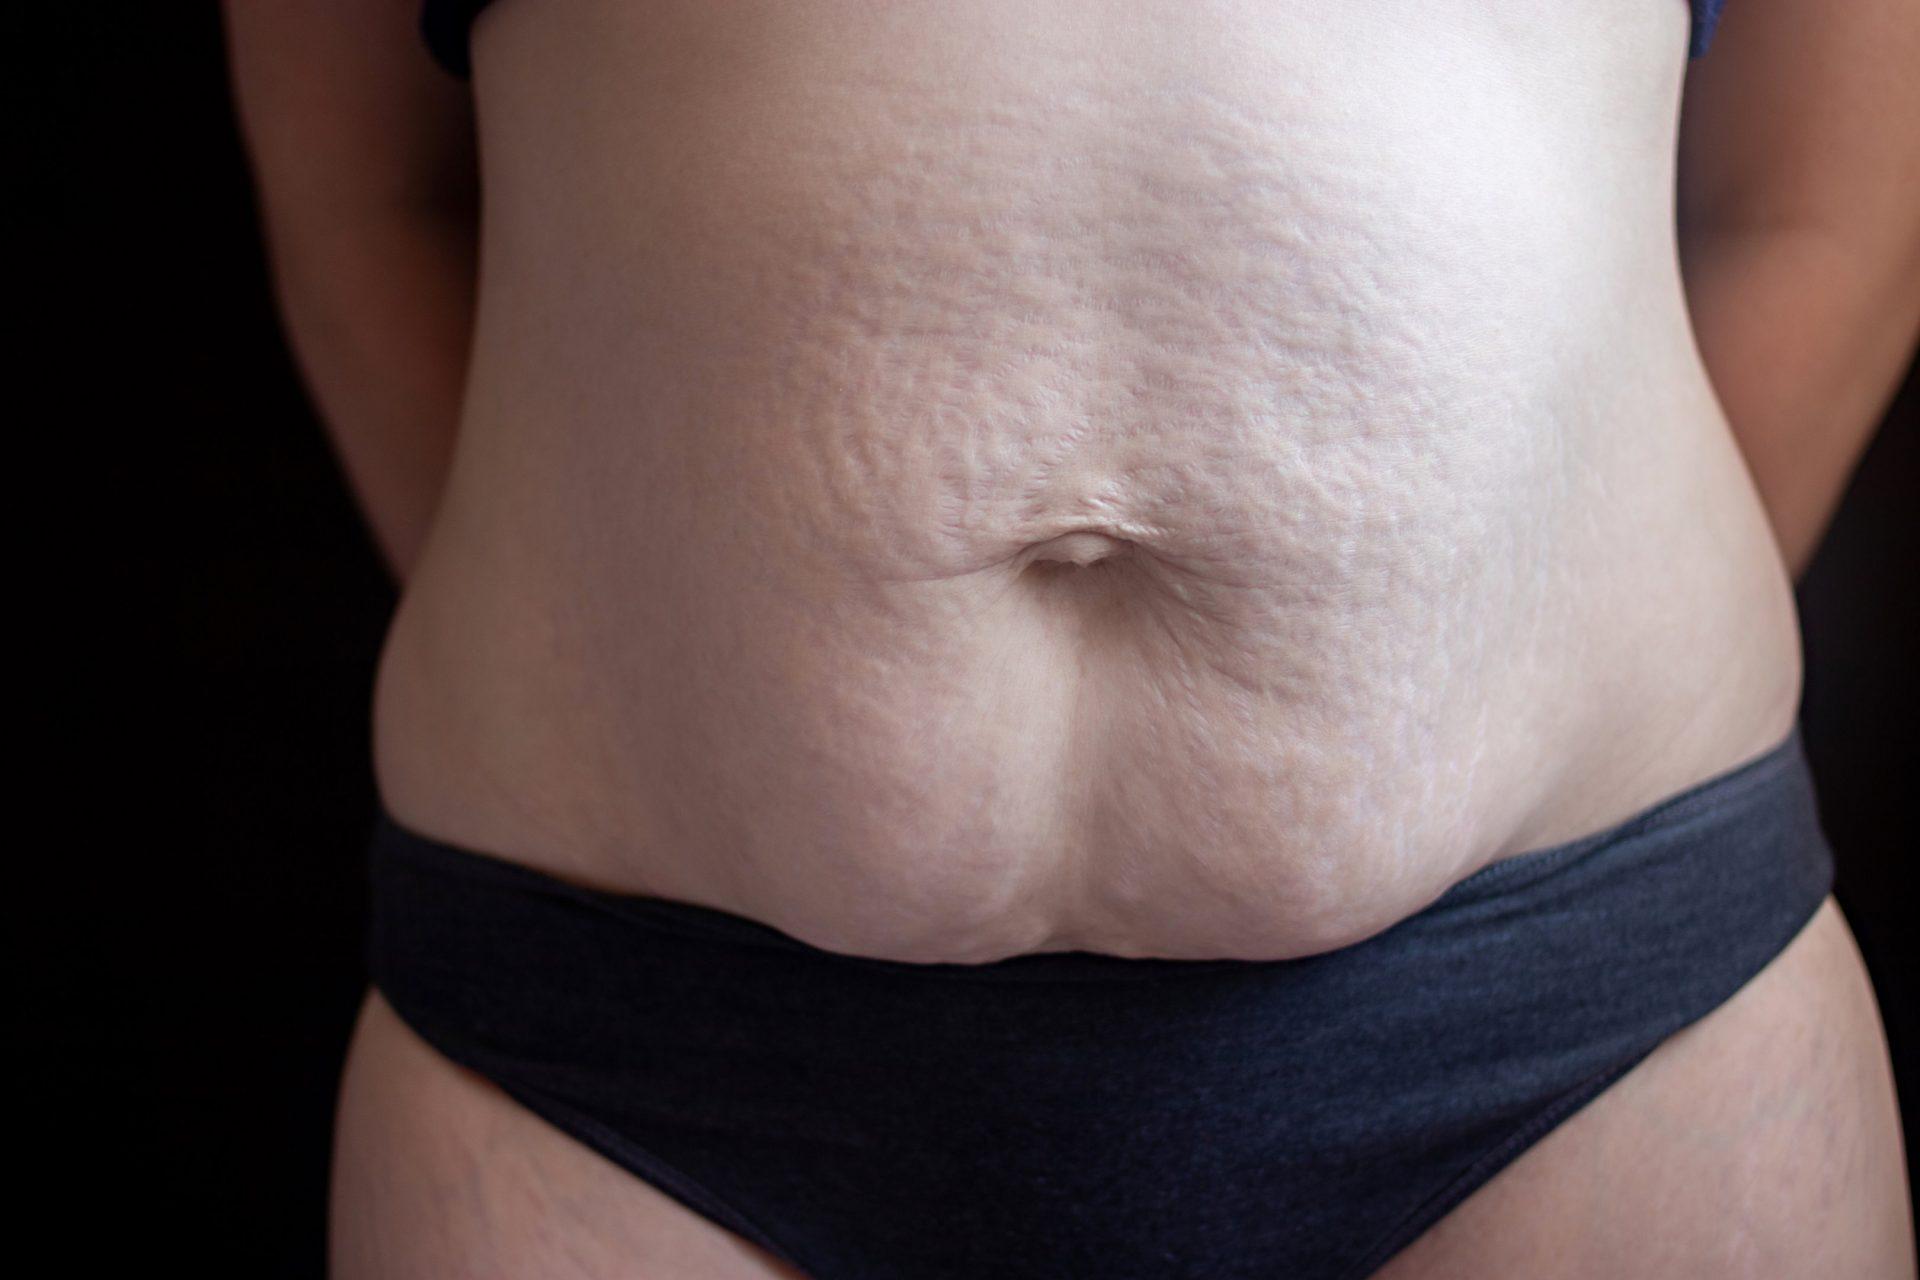 Vientre mujer postparto diastasis y estrias